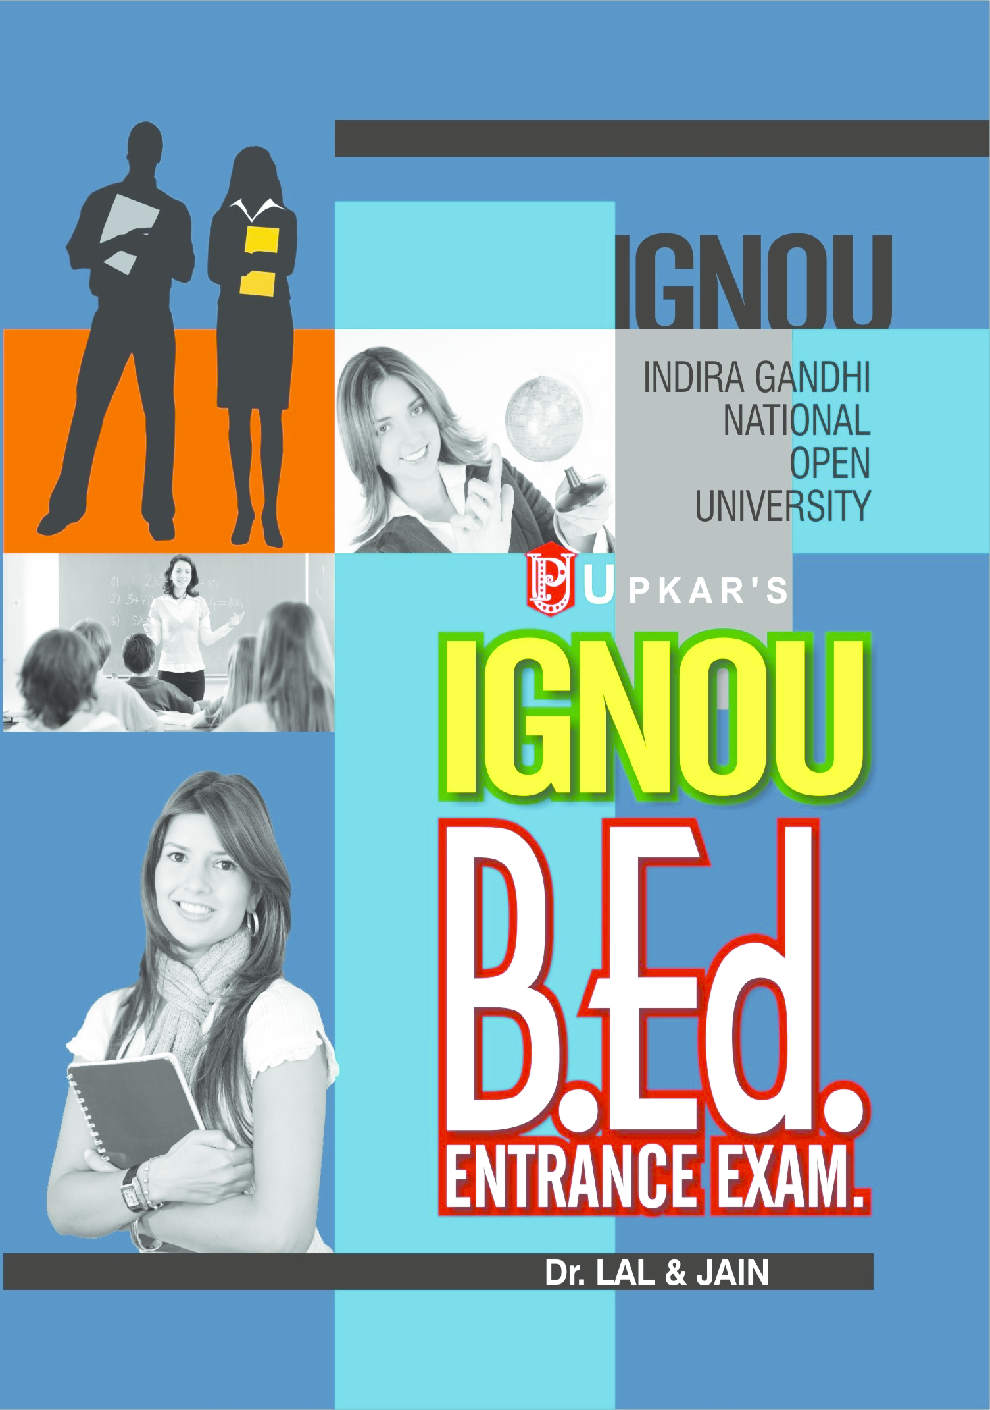 IGNOU B.Ed Entrance Exam. - Page 1